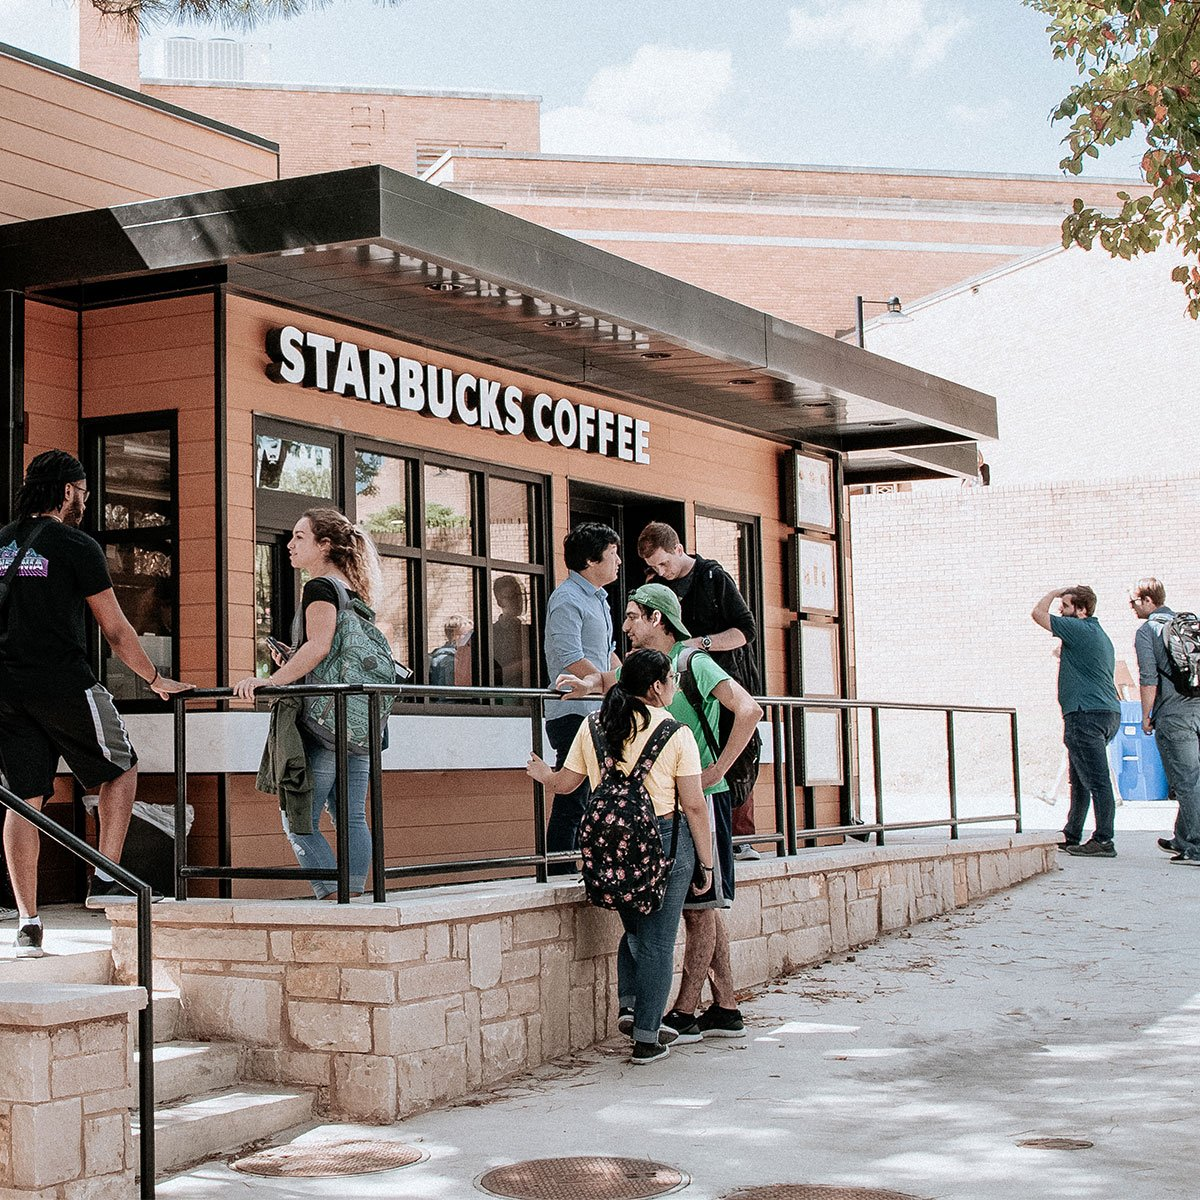 Starbucks stand at UNT